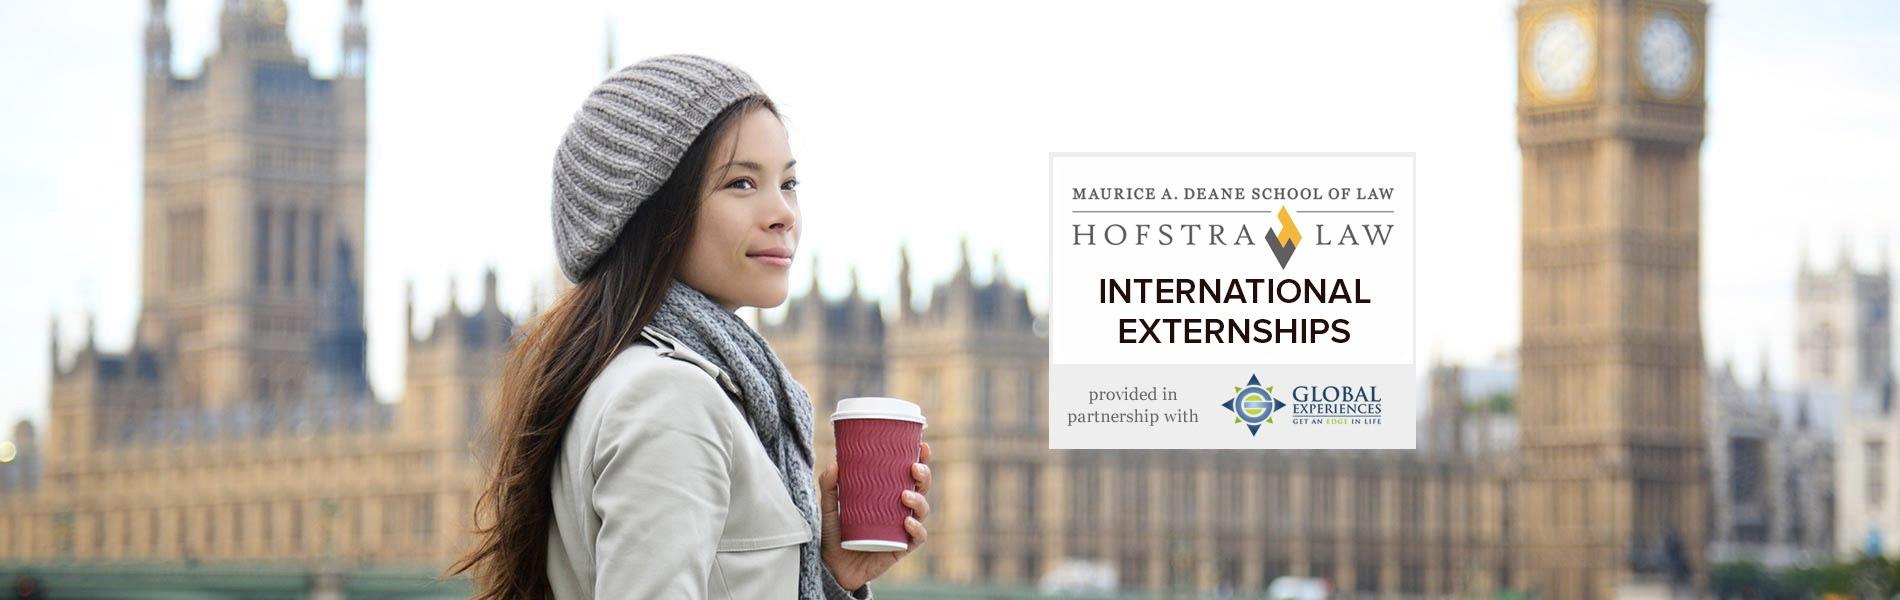 Hofstra Law Externship Abroad